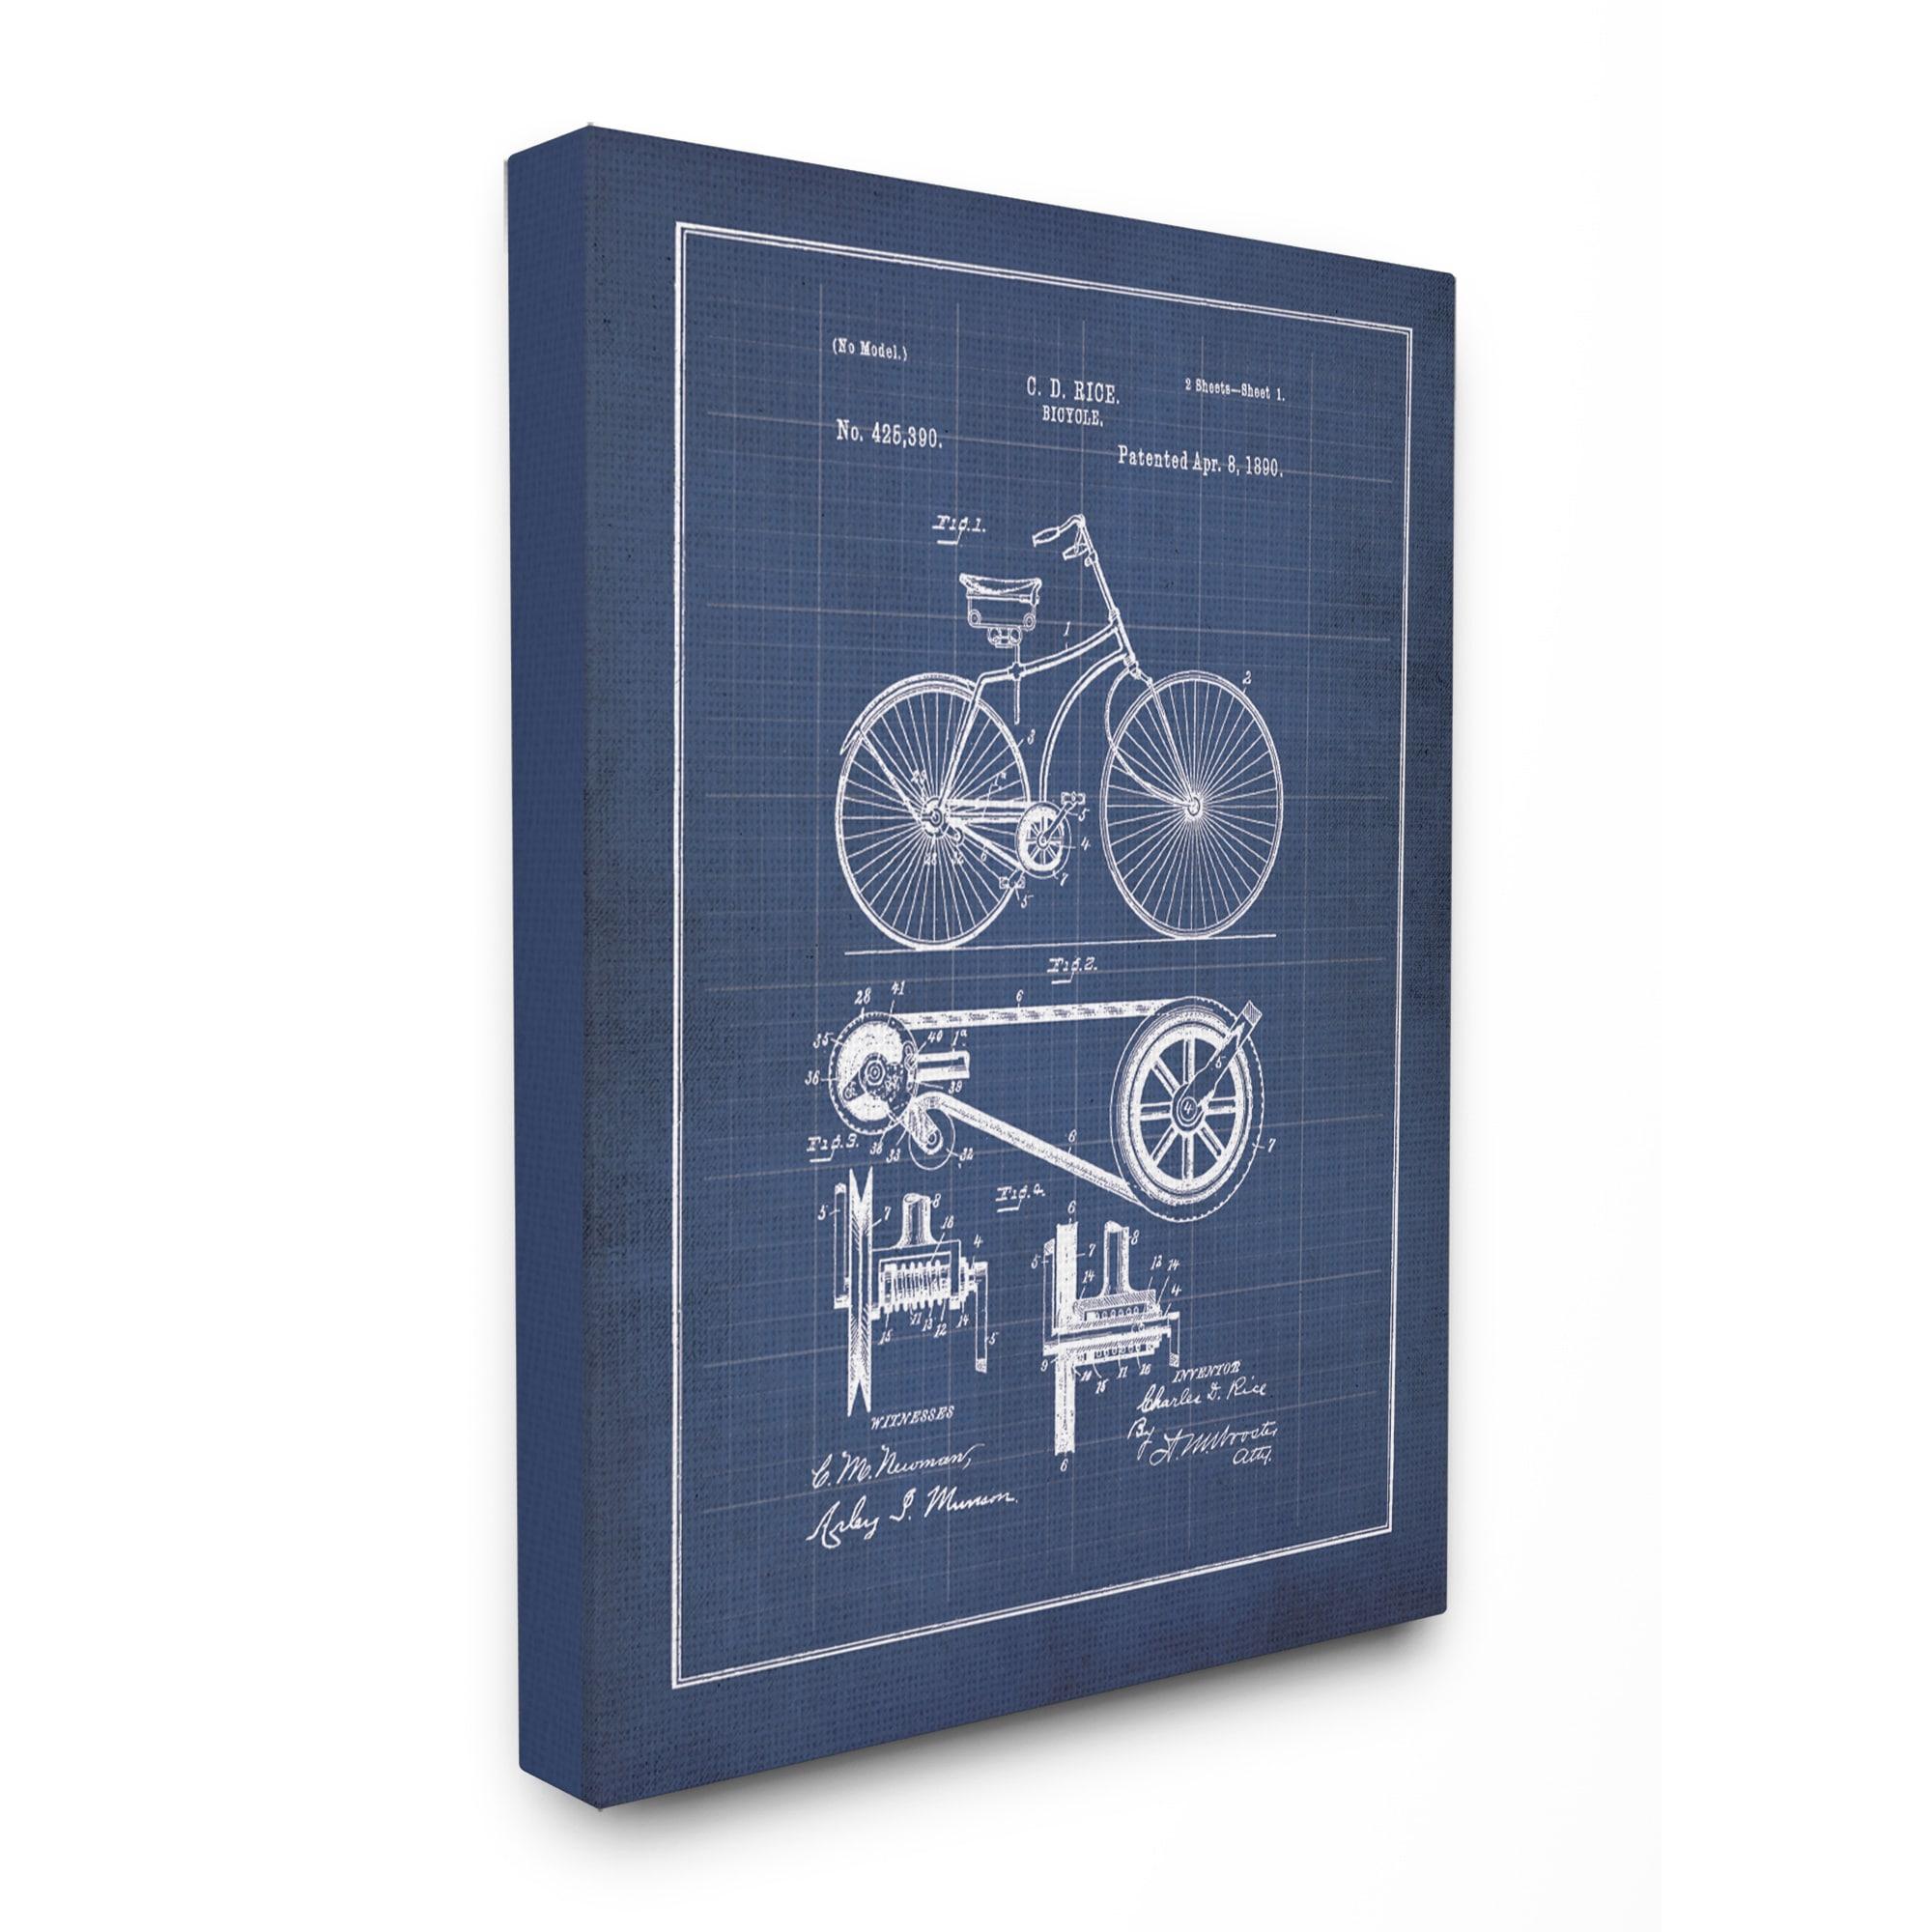 Vintage bike blueprint stretched canvas wall art ebay vintage bike blueprint stretched canvas wall art malvernweather Images